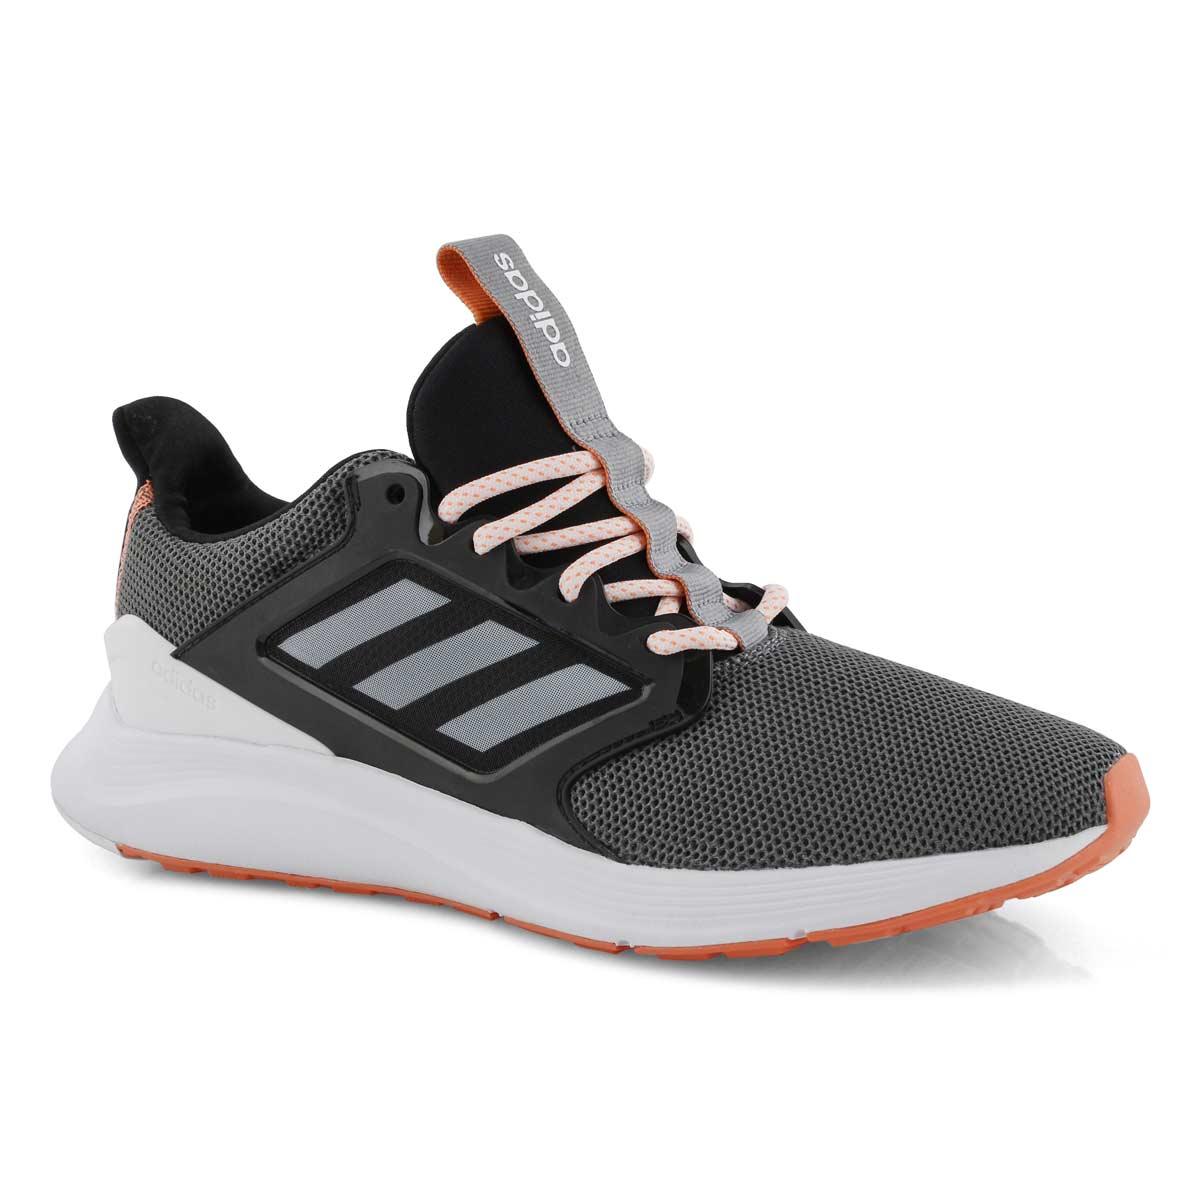 Women's ENERGY FALCON X black/white running shoes